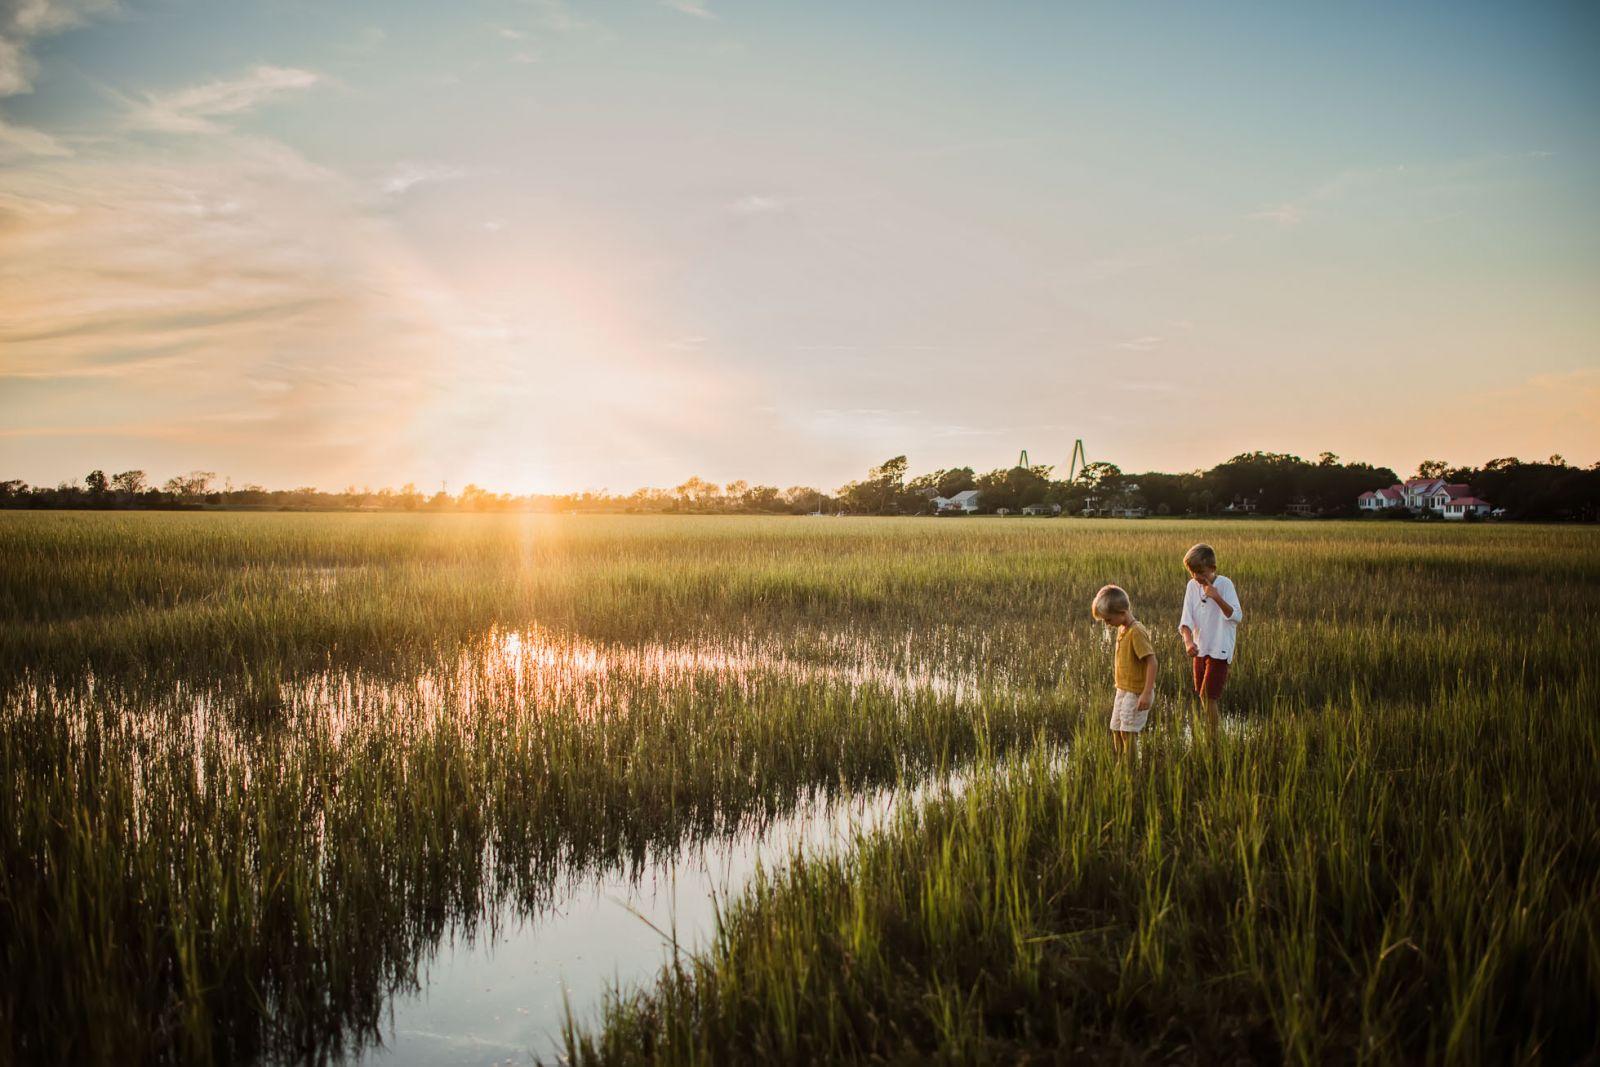 sunset landscape with two boys in SC salt marsh